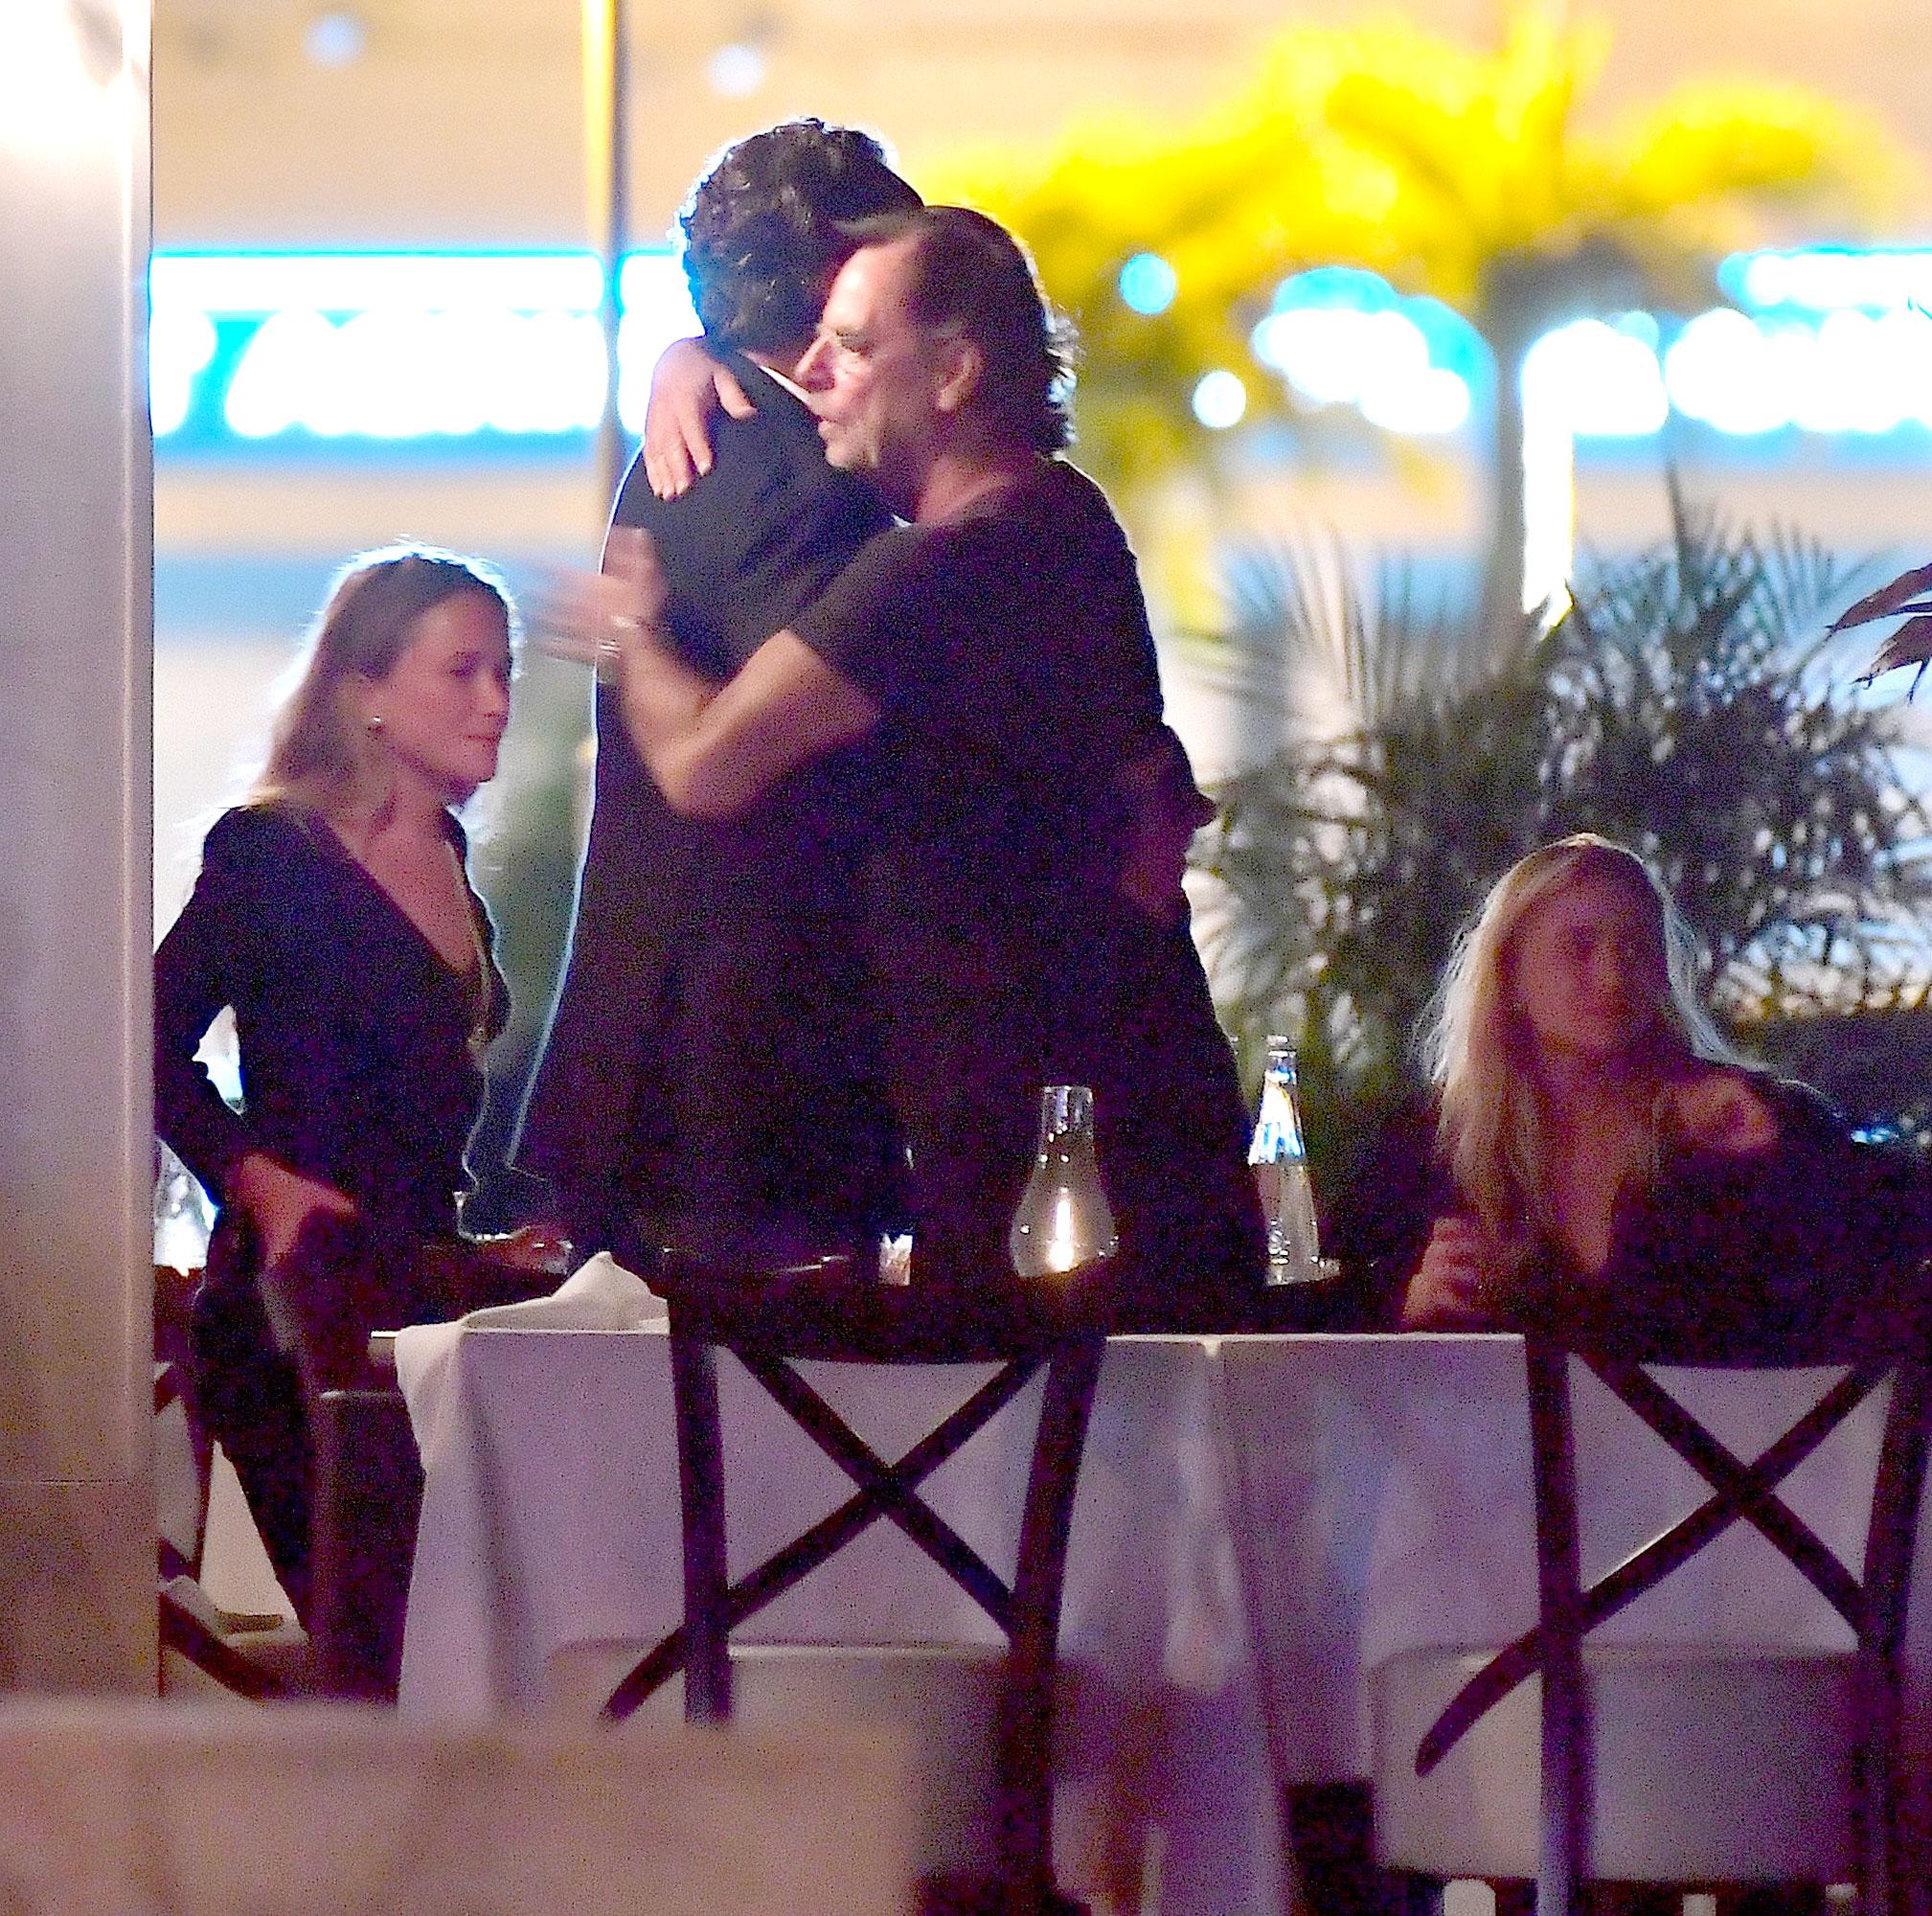 Mary Kate Olsen, Olivier Sarkozy, Richard Sachs and Ashley Olsen